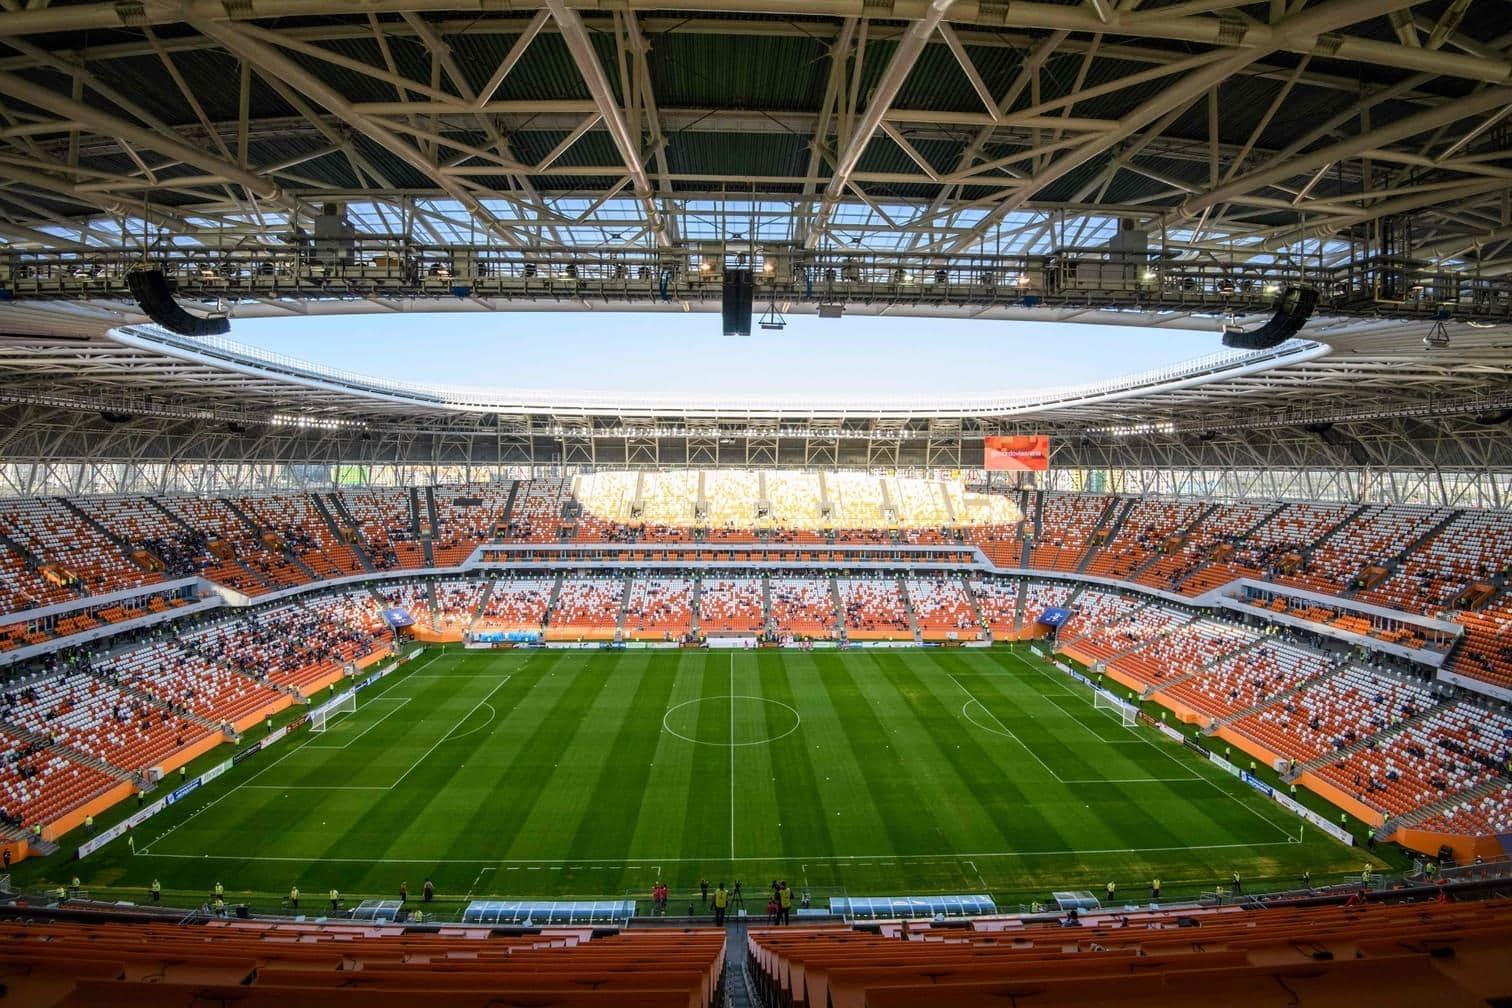 <p>- Gruppenspiele: Russland - Saudi-Arabien (14. Juni); Deutschland - Mexiko (17. Juni); Portugal - Marokko (20. Juni); Dänemark - Frankreich (26. Juni)<br />- 1 Achtelfinale